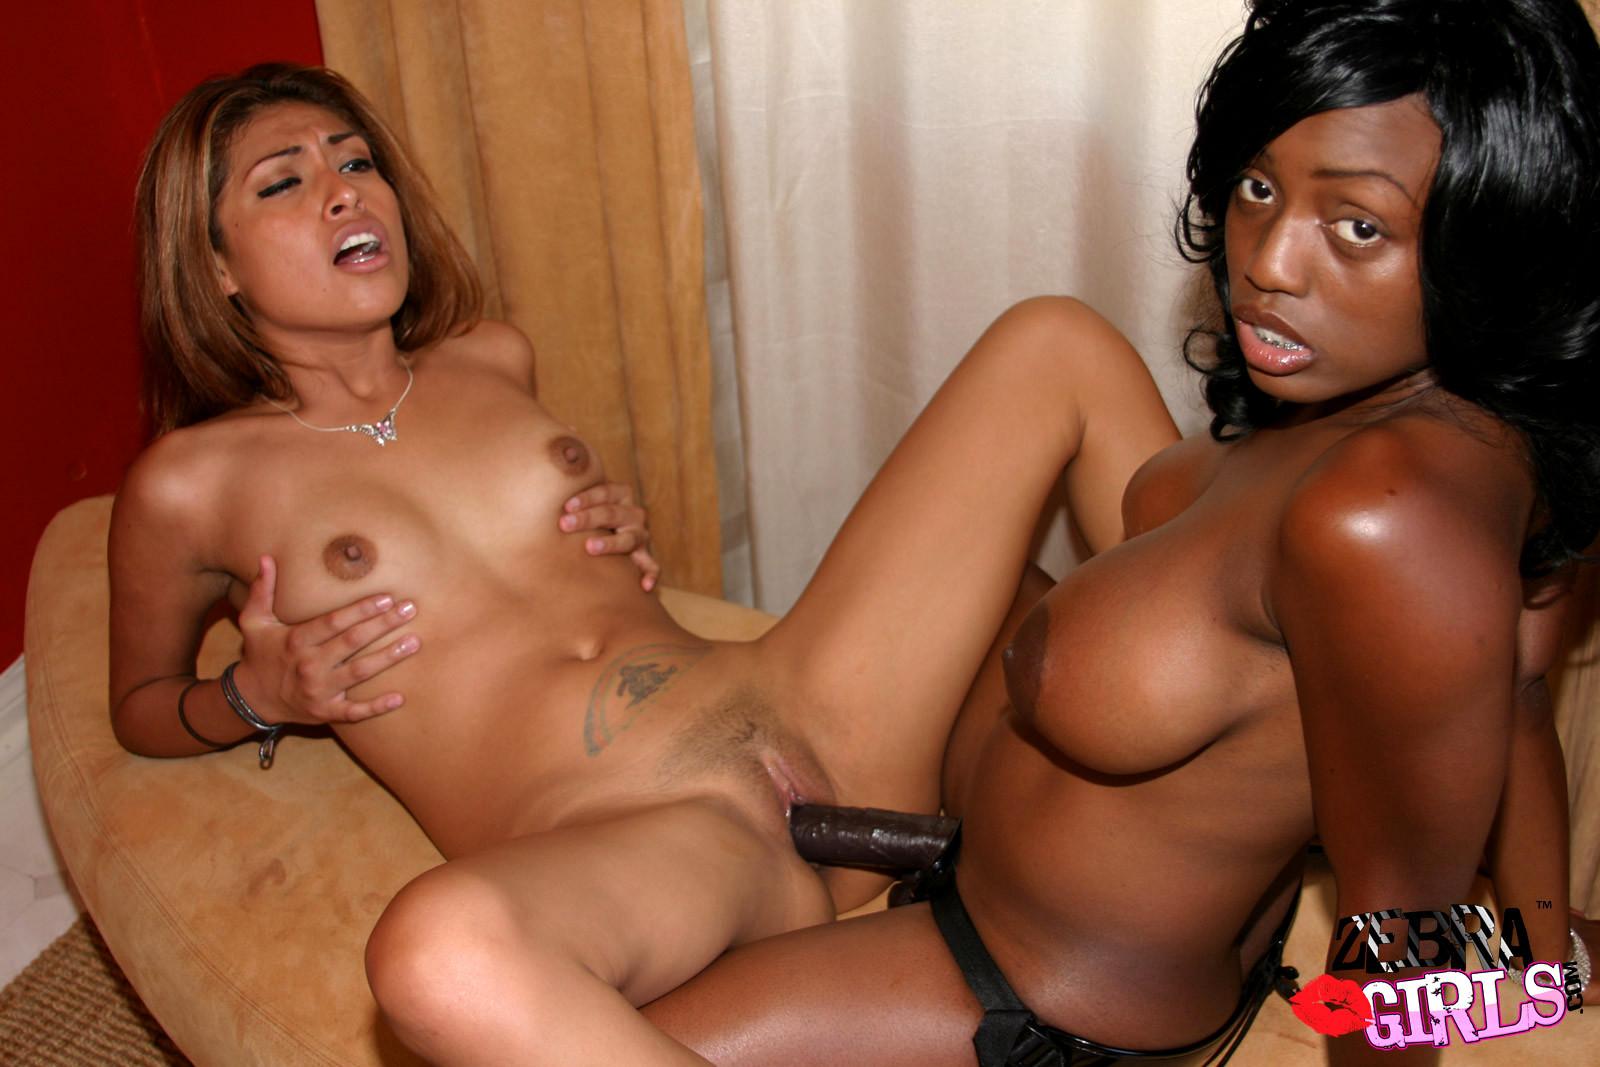 Babe Today Zebra Girls Jada Fire Hq Lesbian Vip Tube Porn Pics-6487